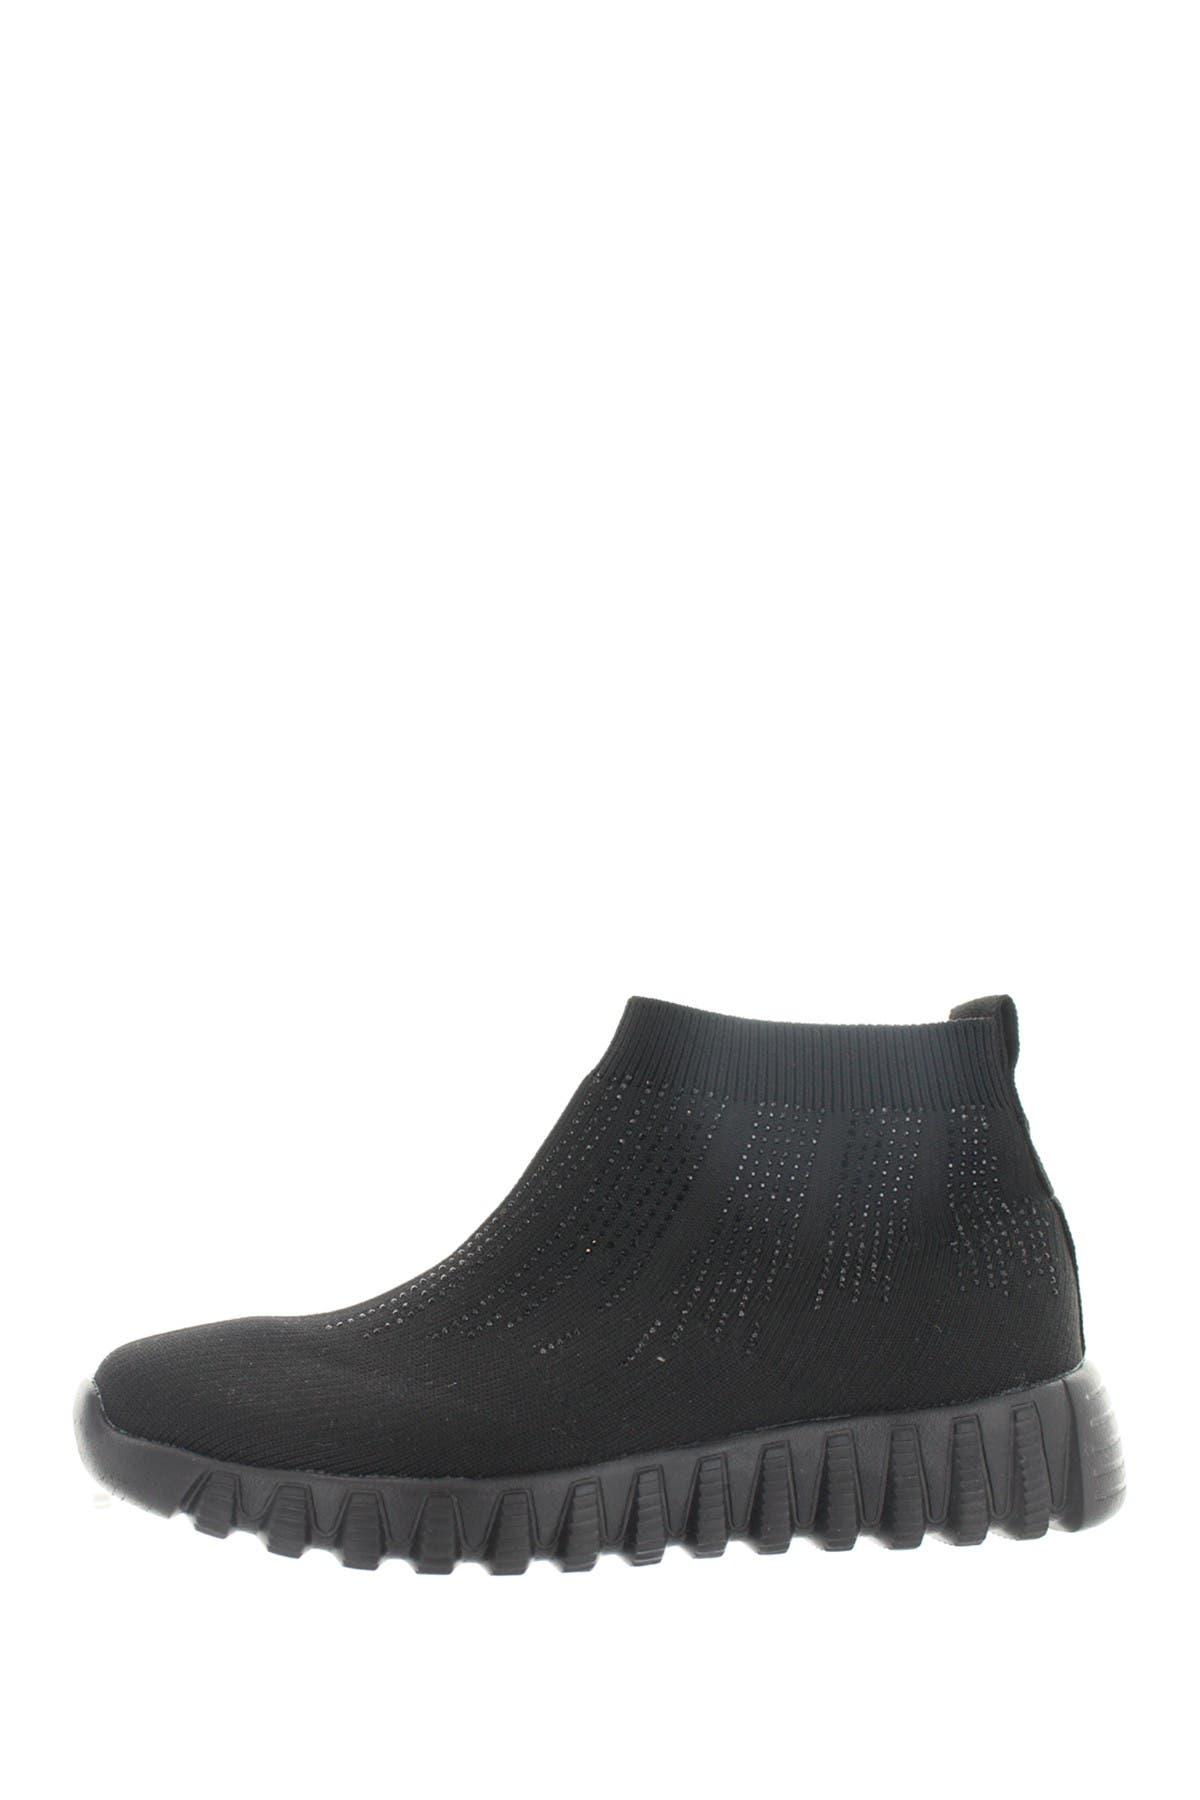 Bernie Mev   Leighton Knit Sneaker